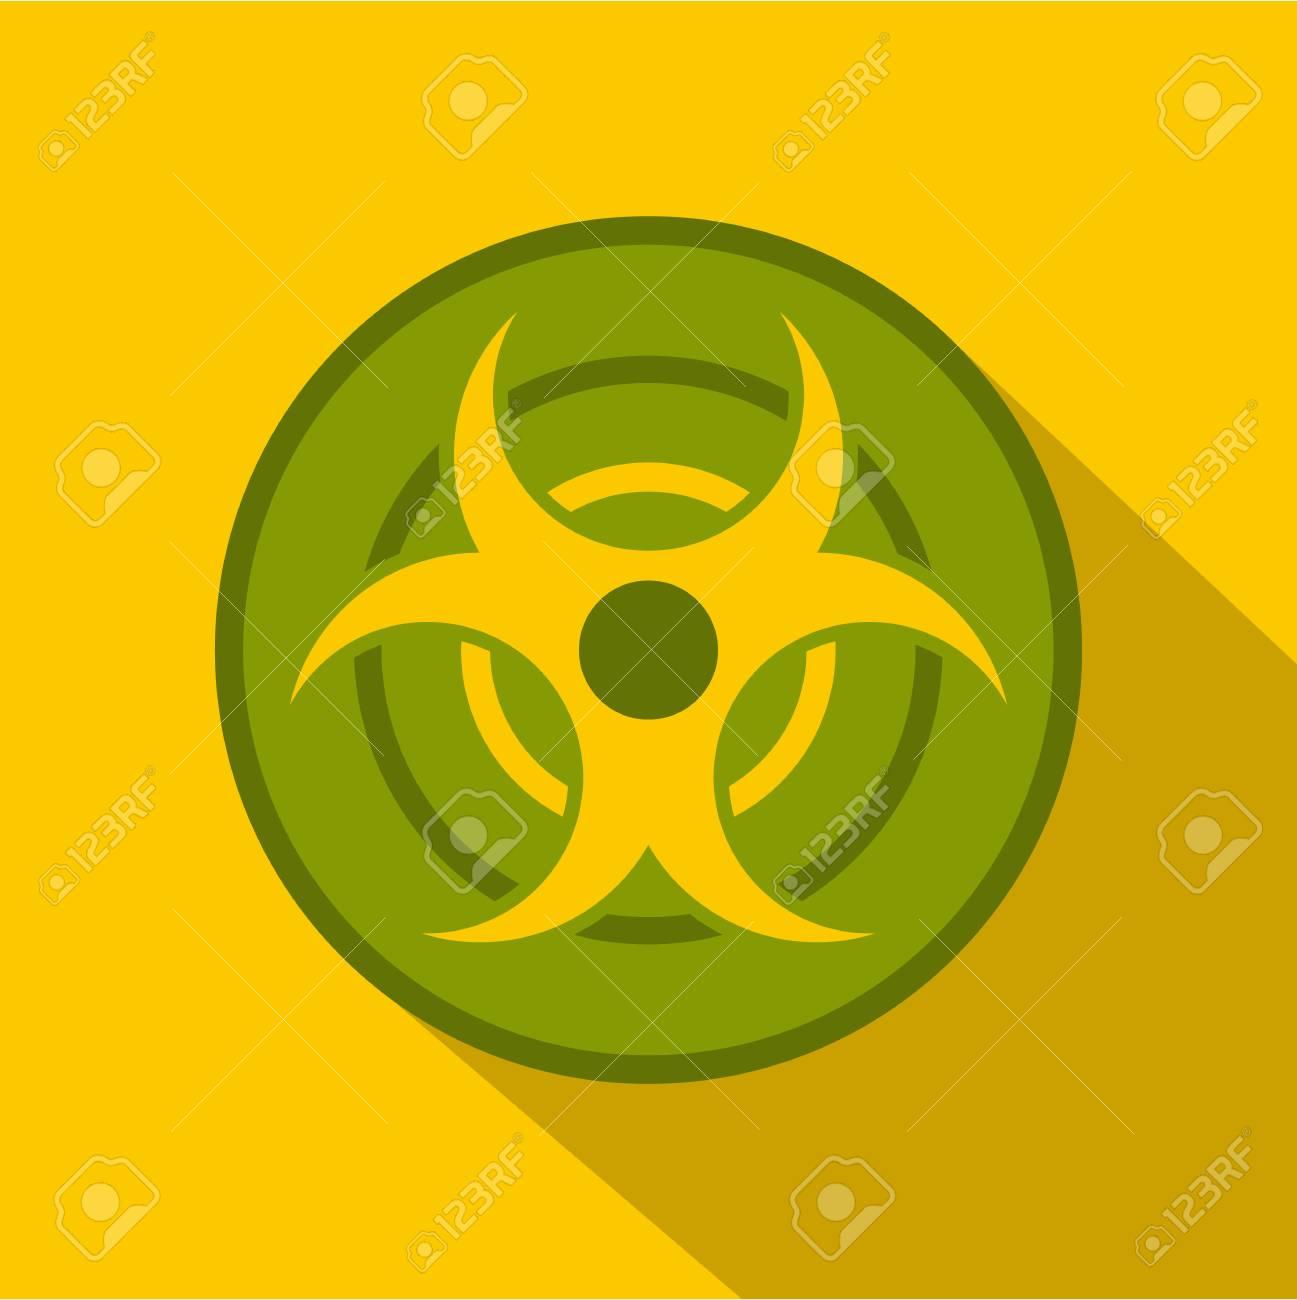 Biohazard Symbol Icon Flat Style Royalty Free Cliparts Vectors